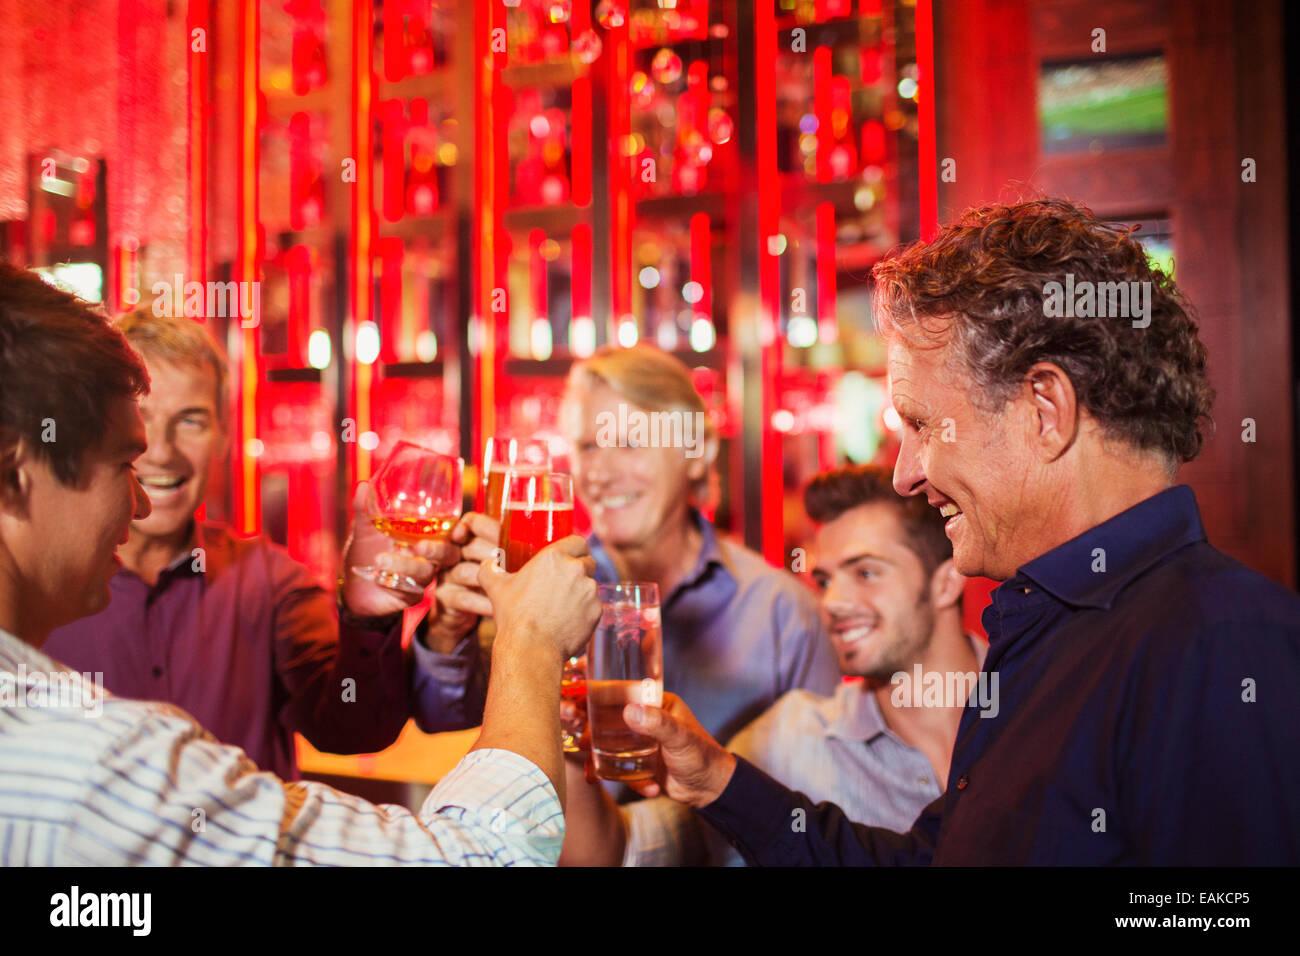 Five smiling men raising toast in bar - Stock Image